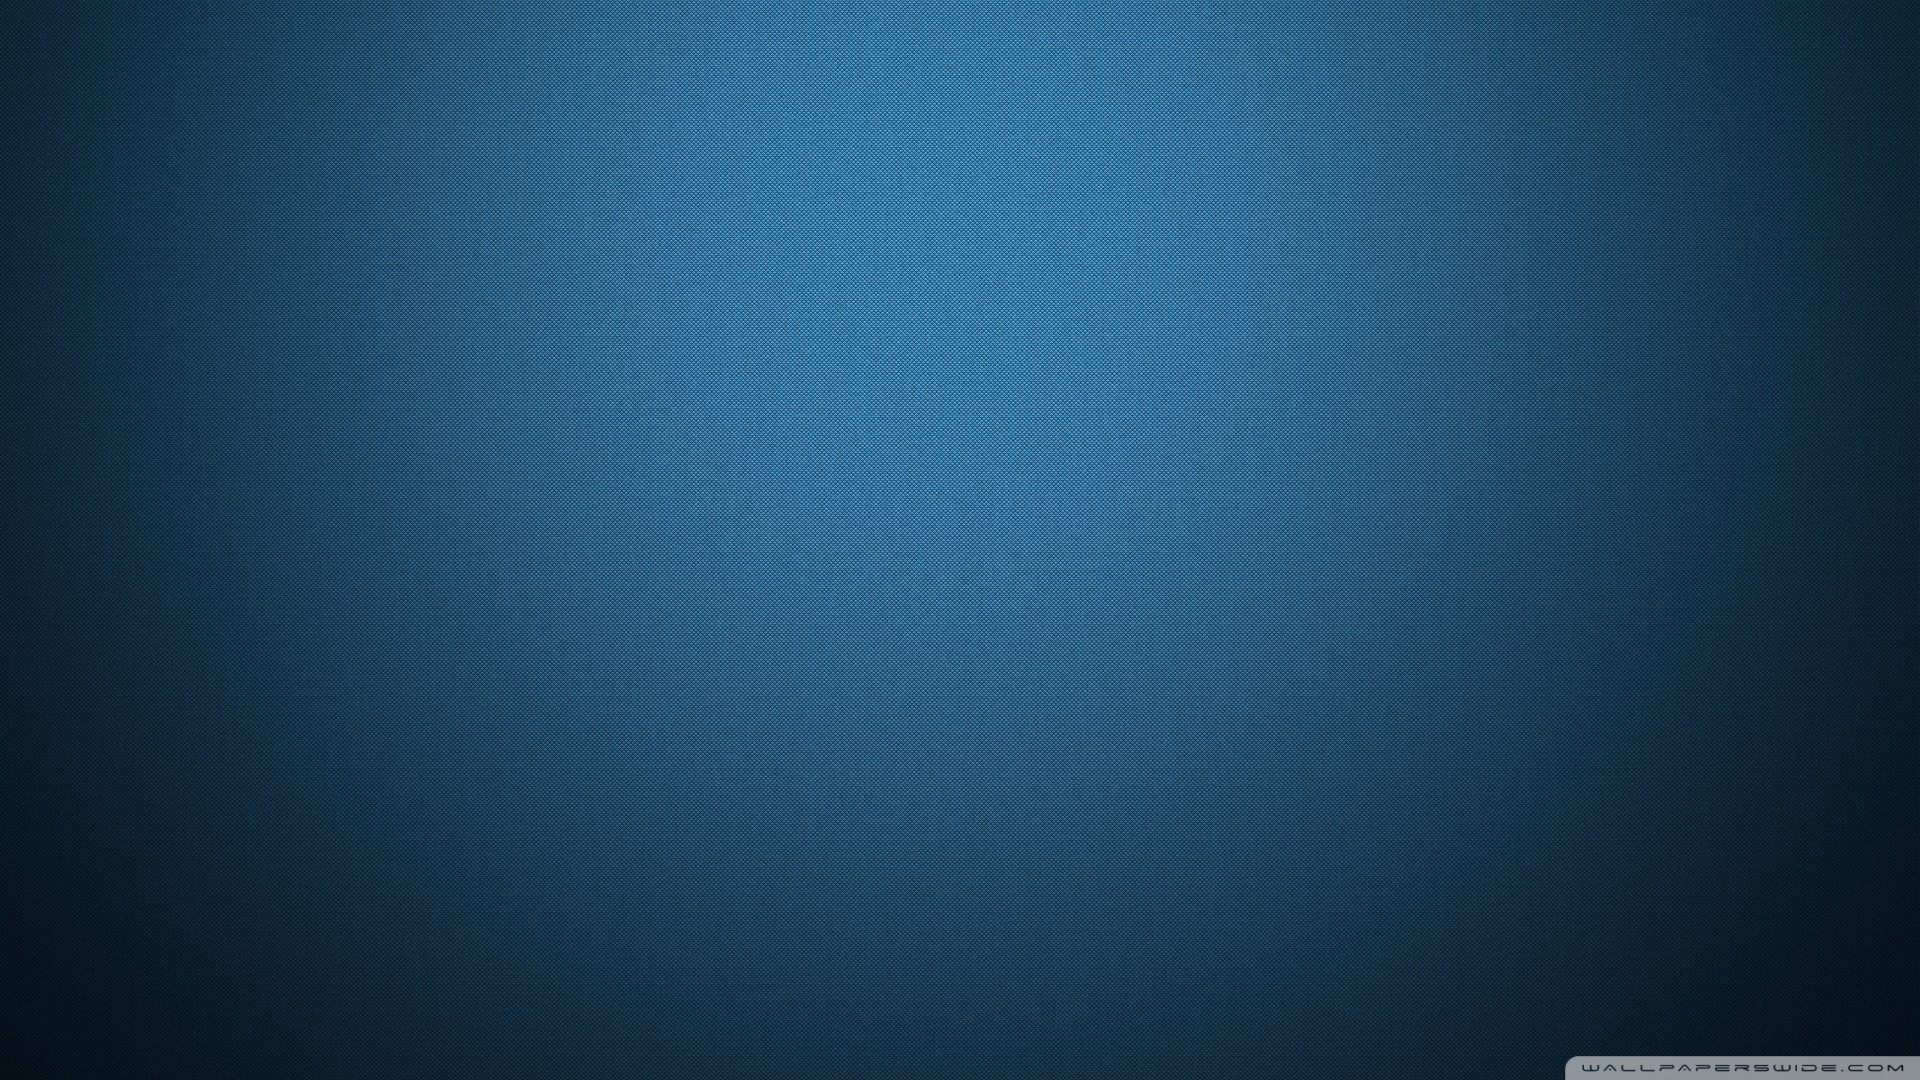 10 Best Dark Blue Hd Background FULL HD 1080p For PC Background